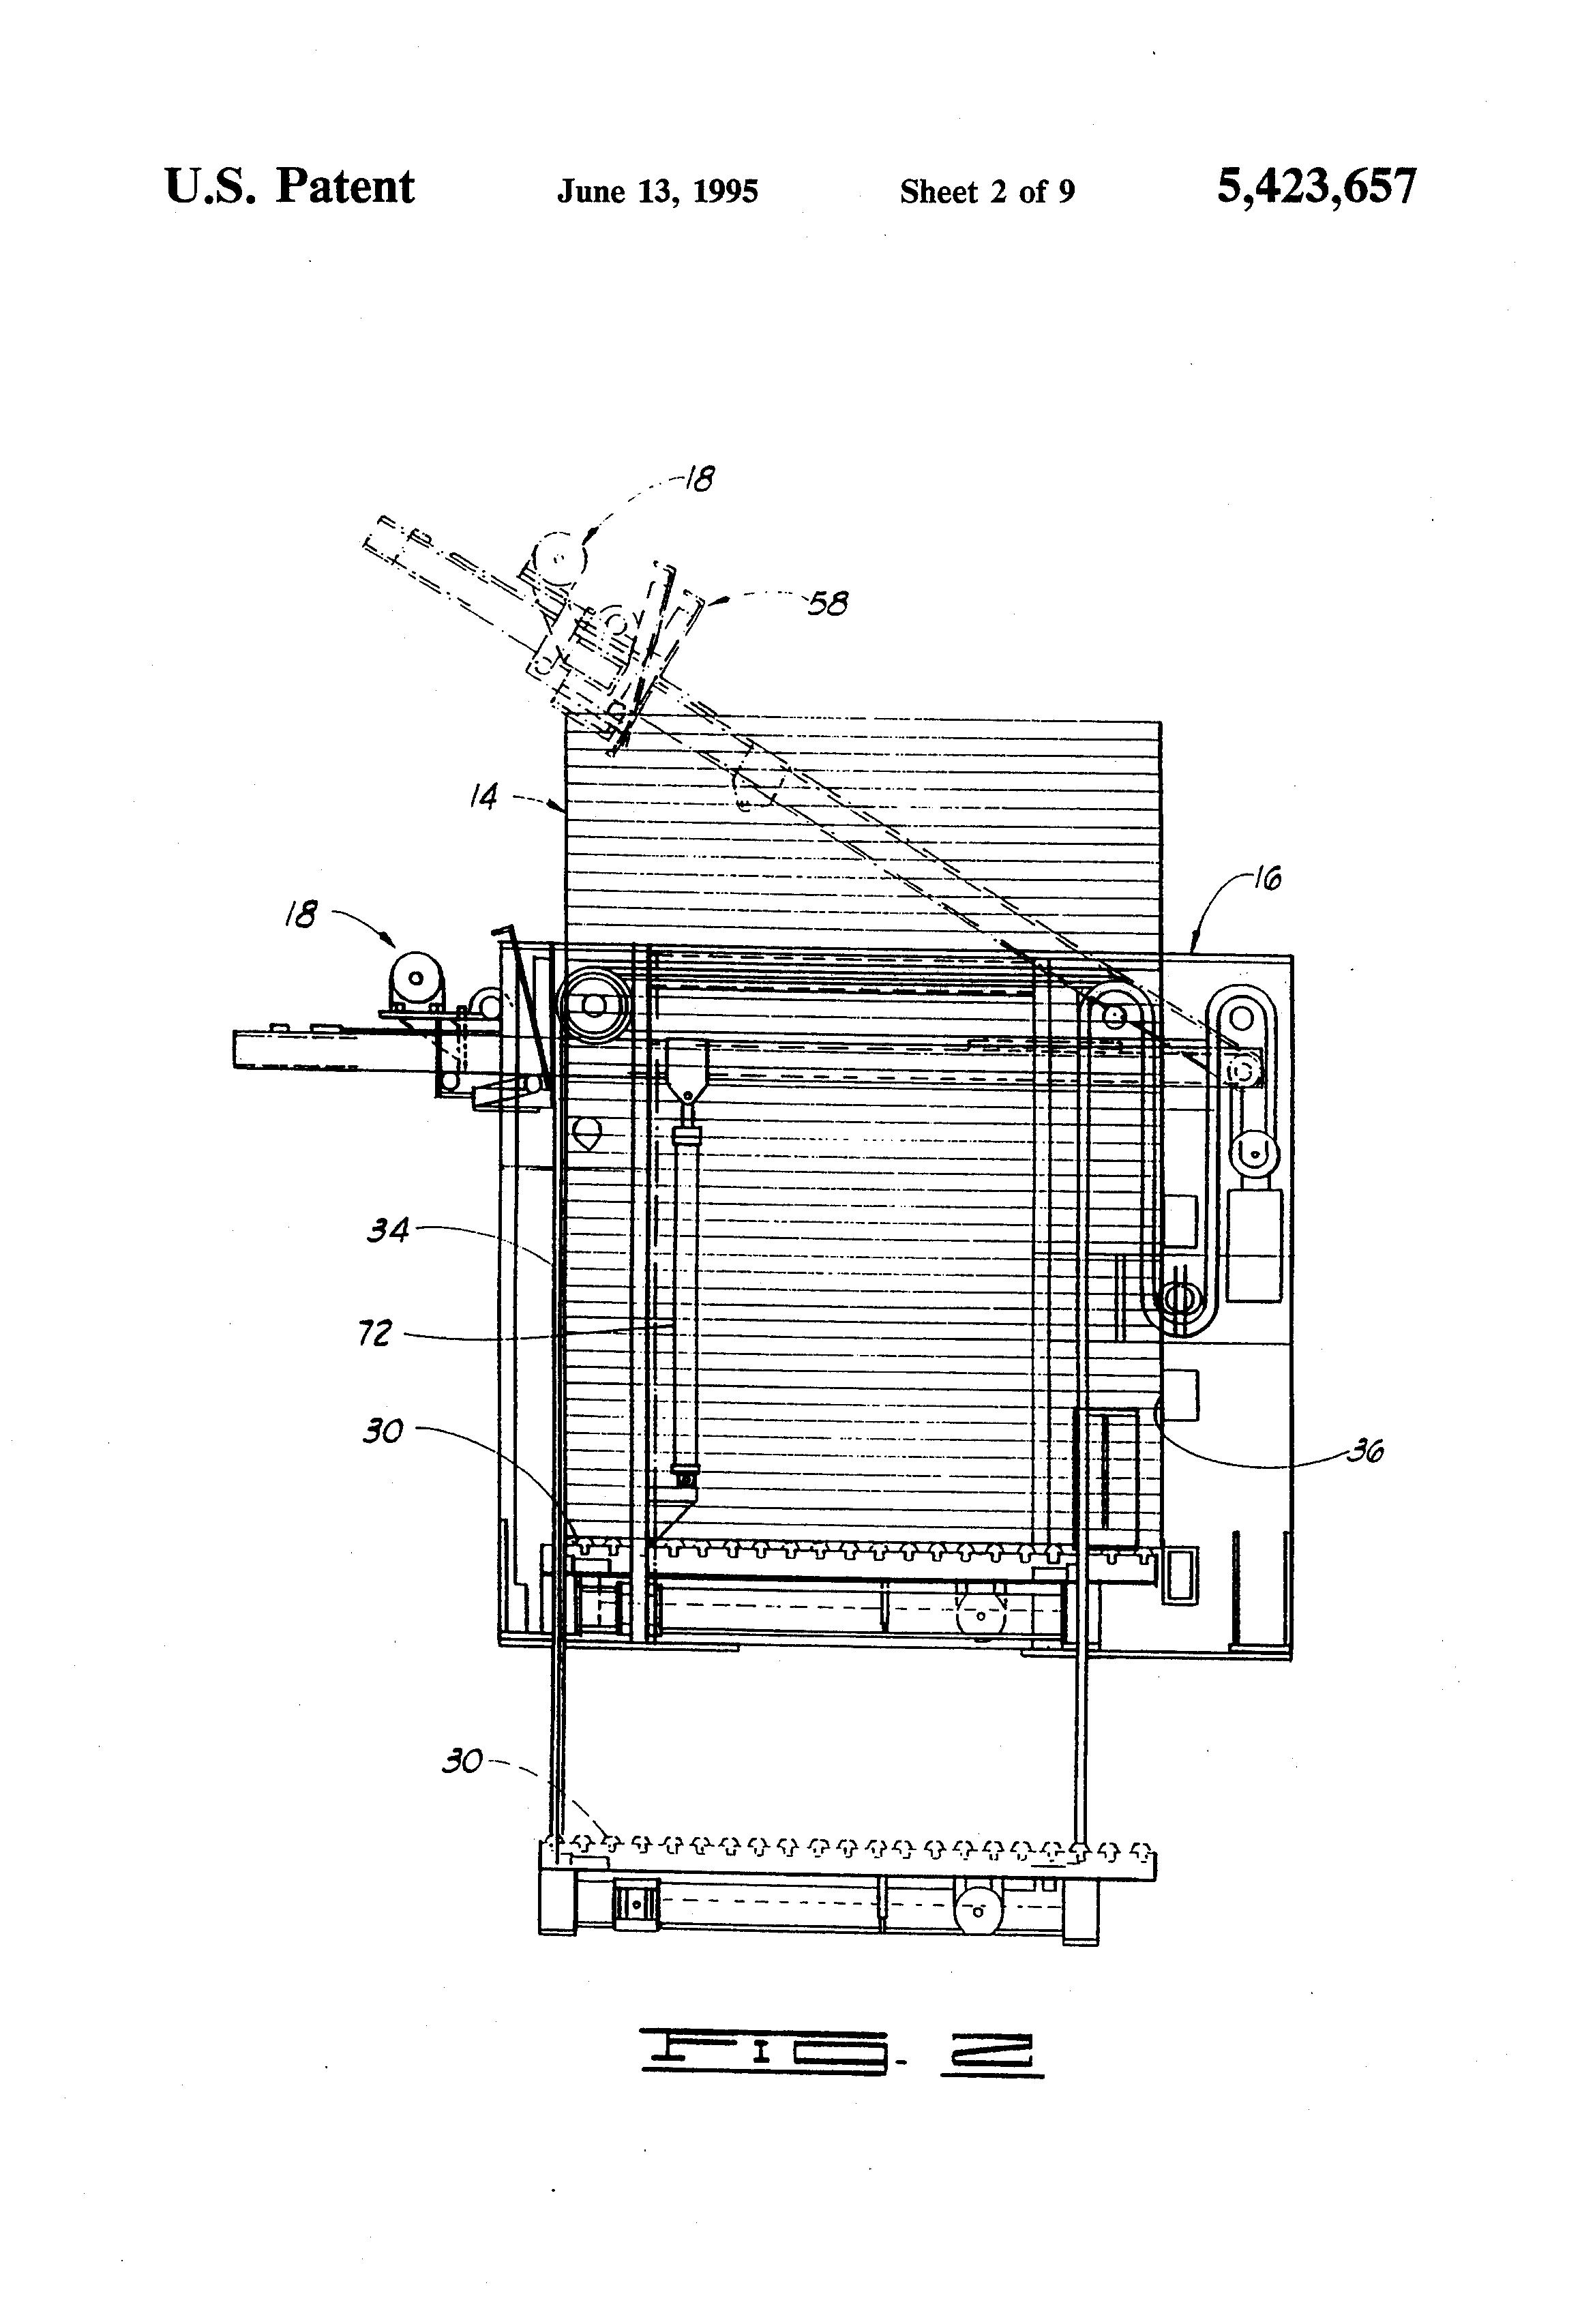 98 Kium Sportage Wiring Diagram